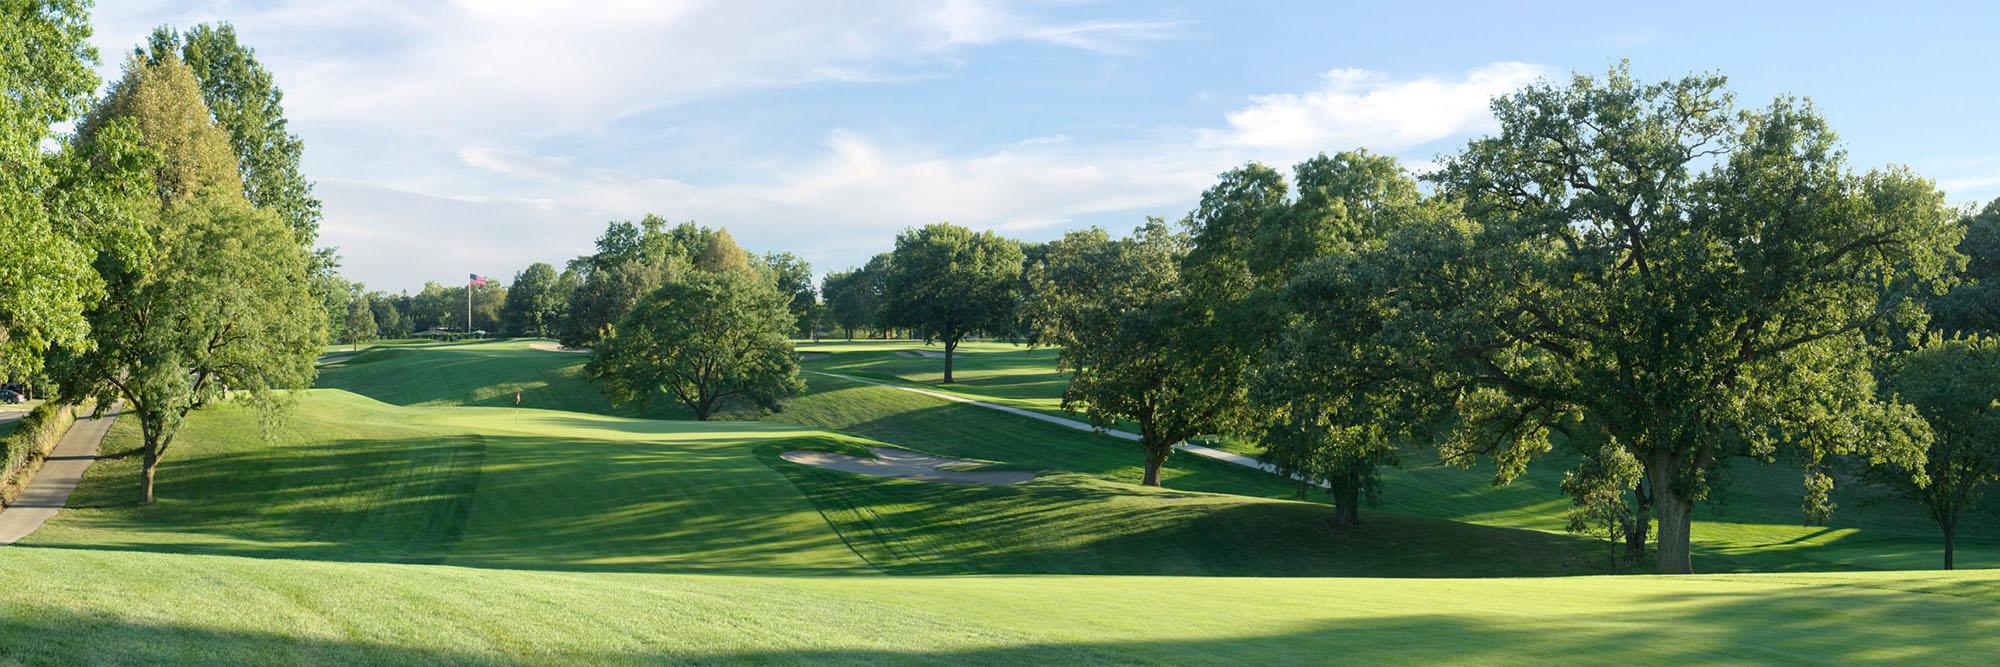 Golf Course Image - Wakonda No. 6